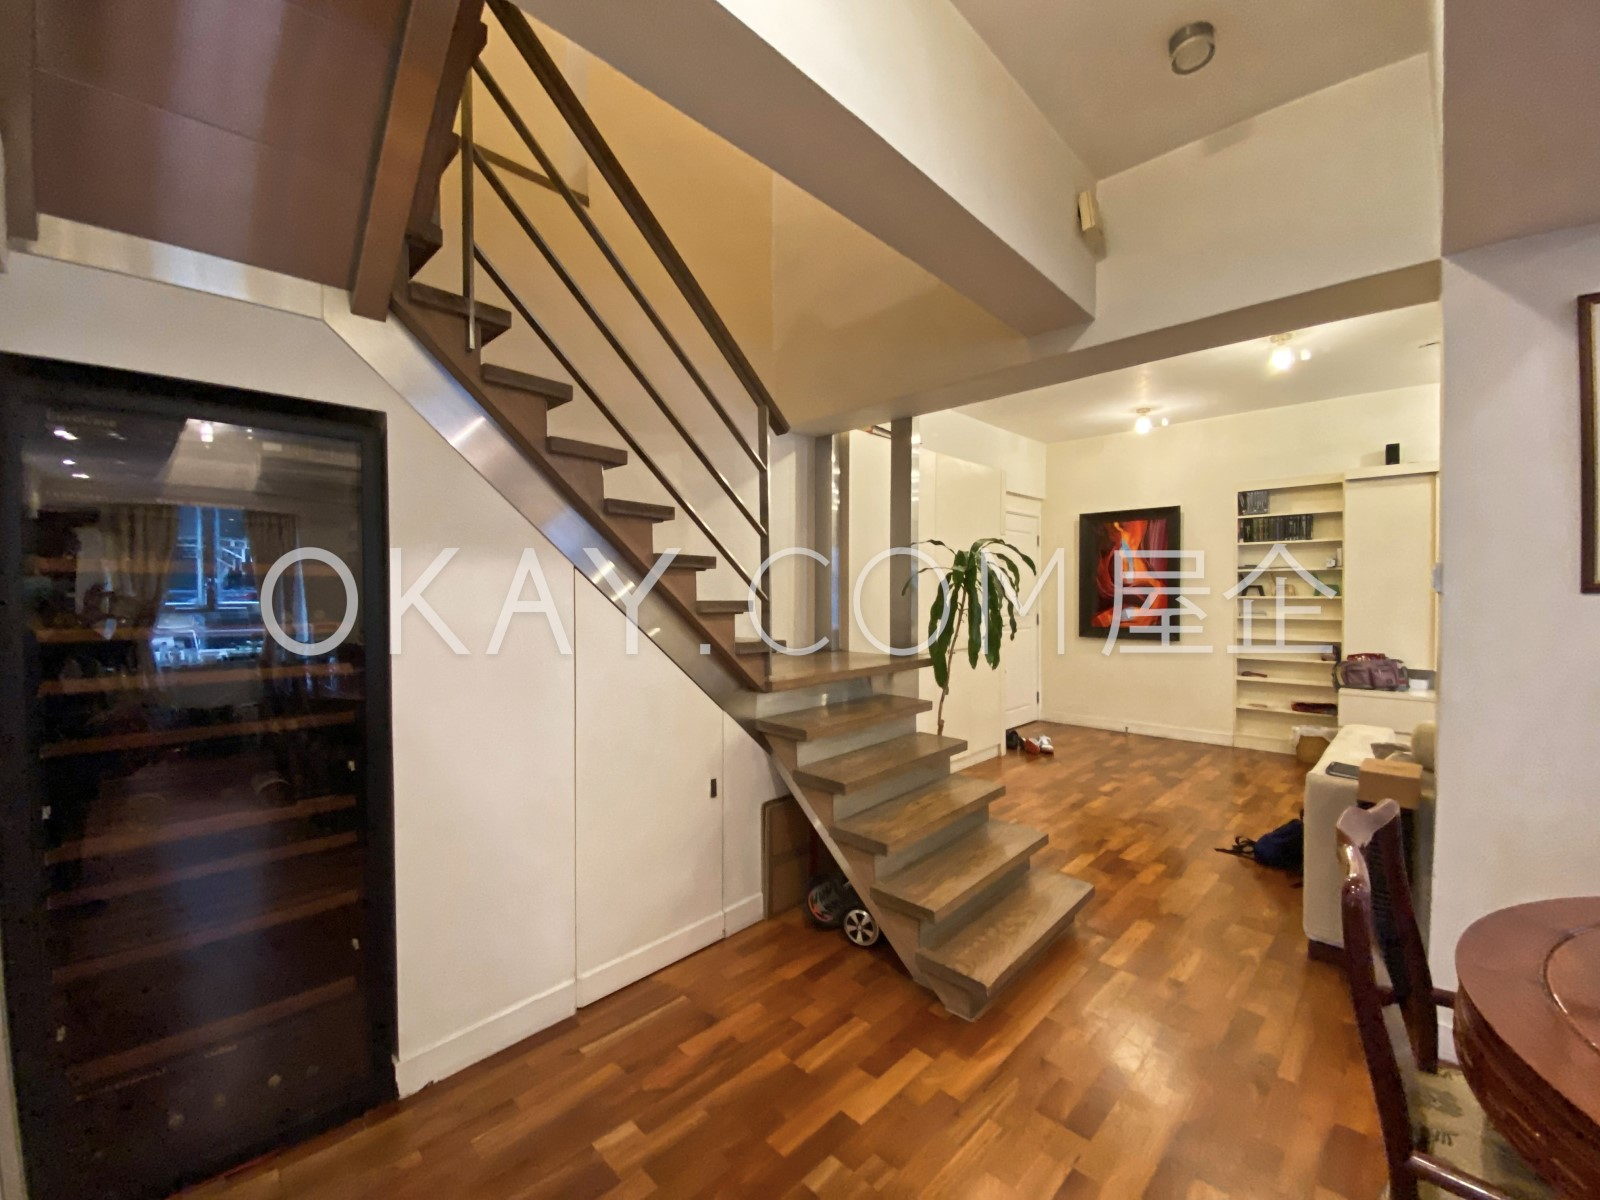 Staircase winefridge